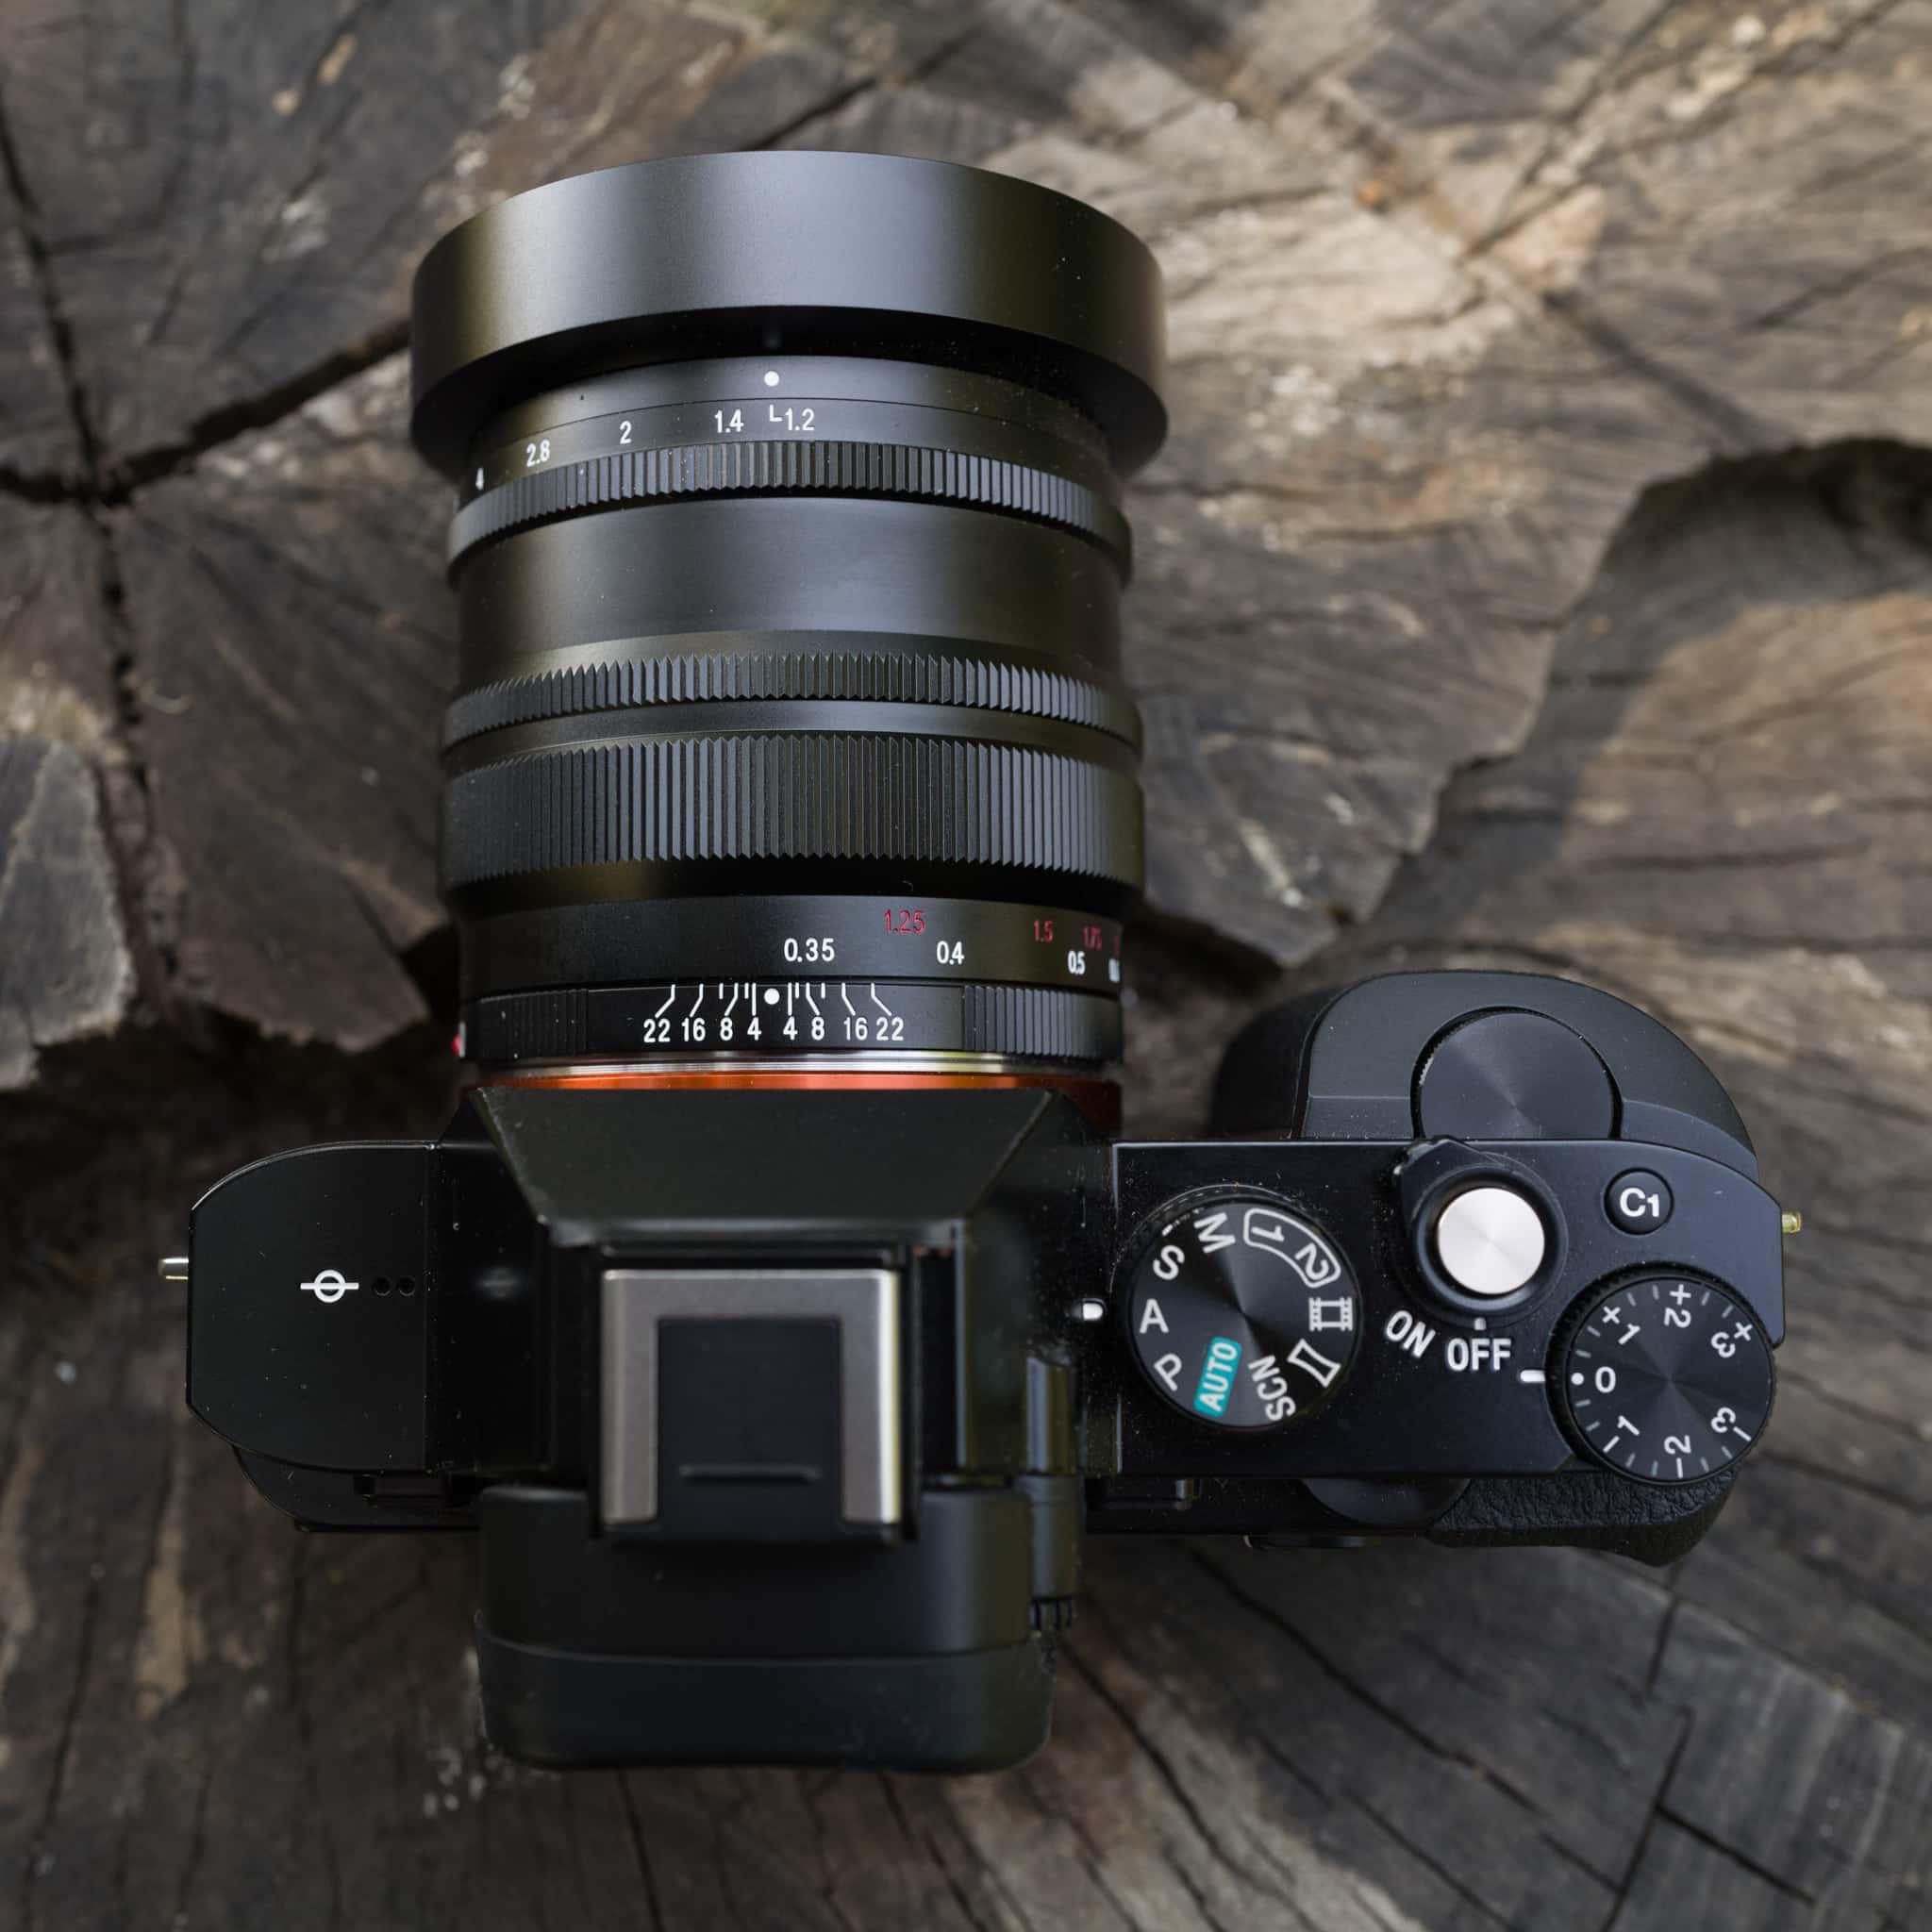 Voigtlander Nokton 40mm f/1.2 SE